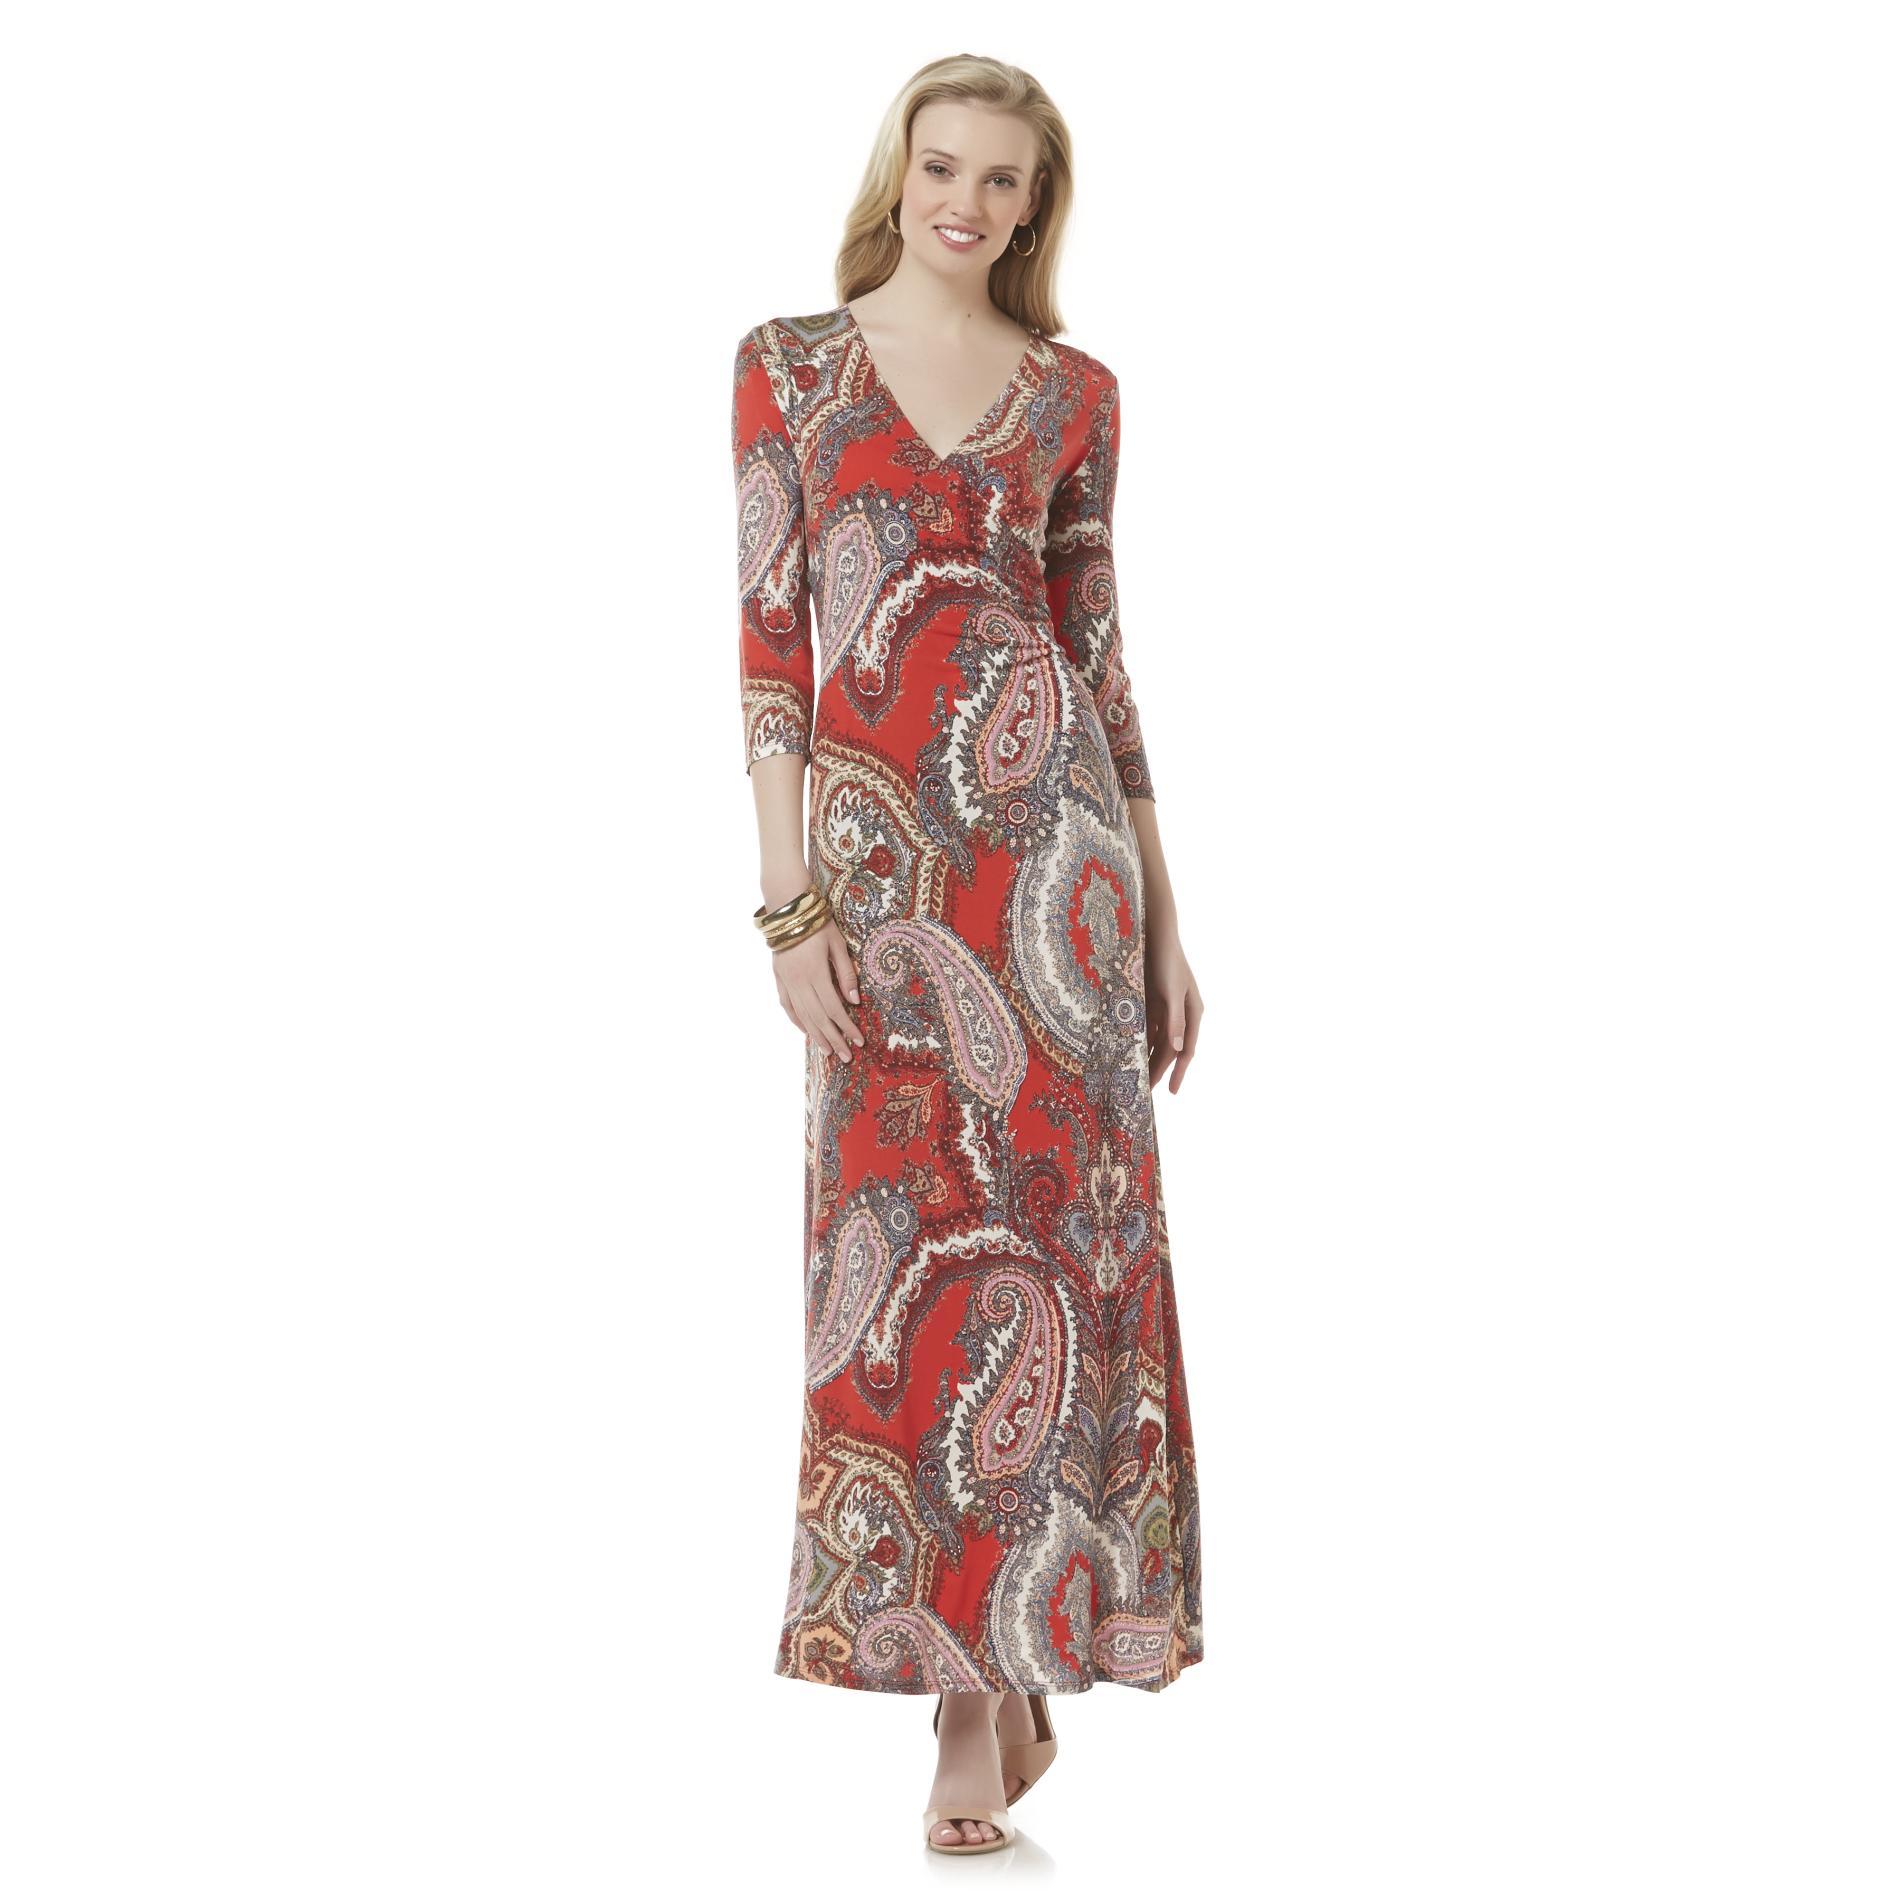 JBS Women's V-Neck Maxi Dress - Floral & Paisley Print